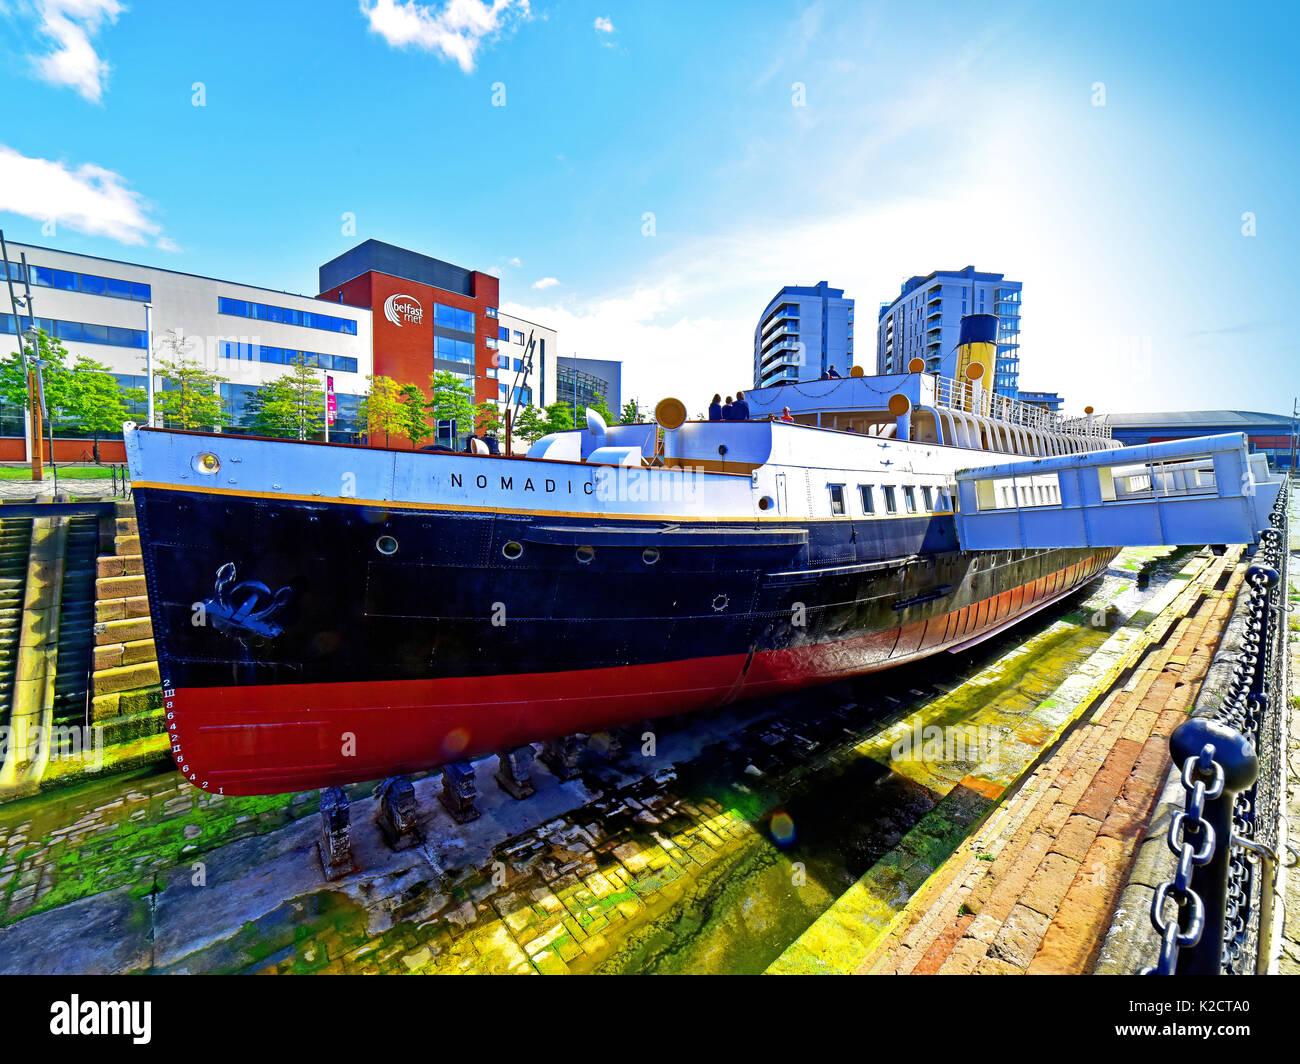 Belfast Northern Ireland Titanic Museum Hamilton dock and Nomadic - Stock Image